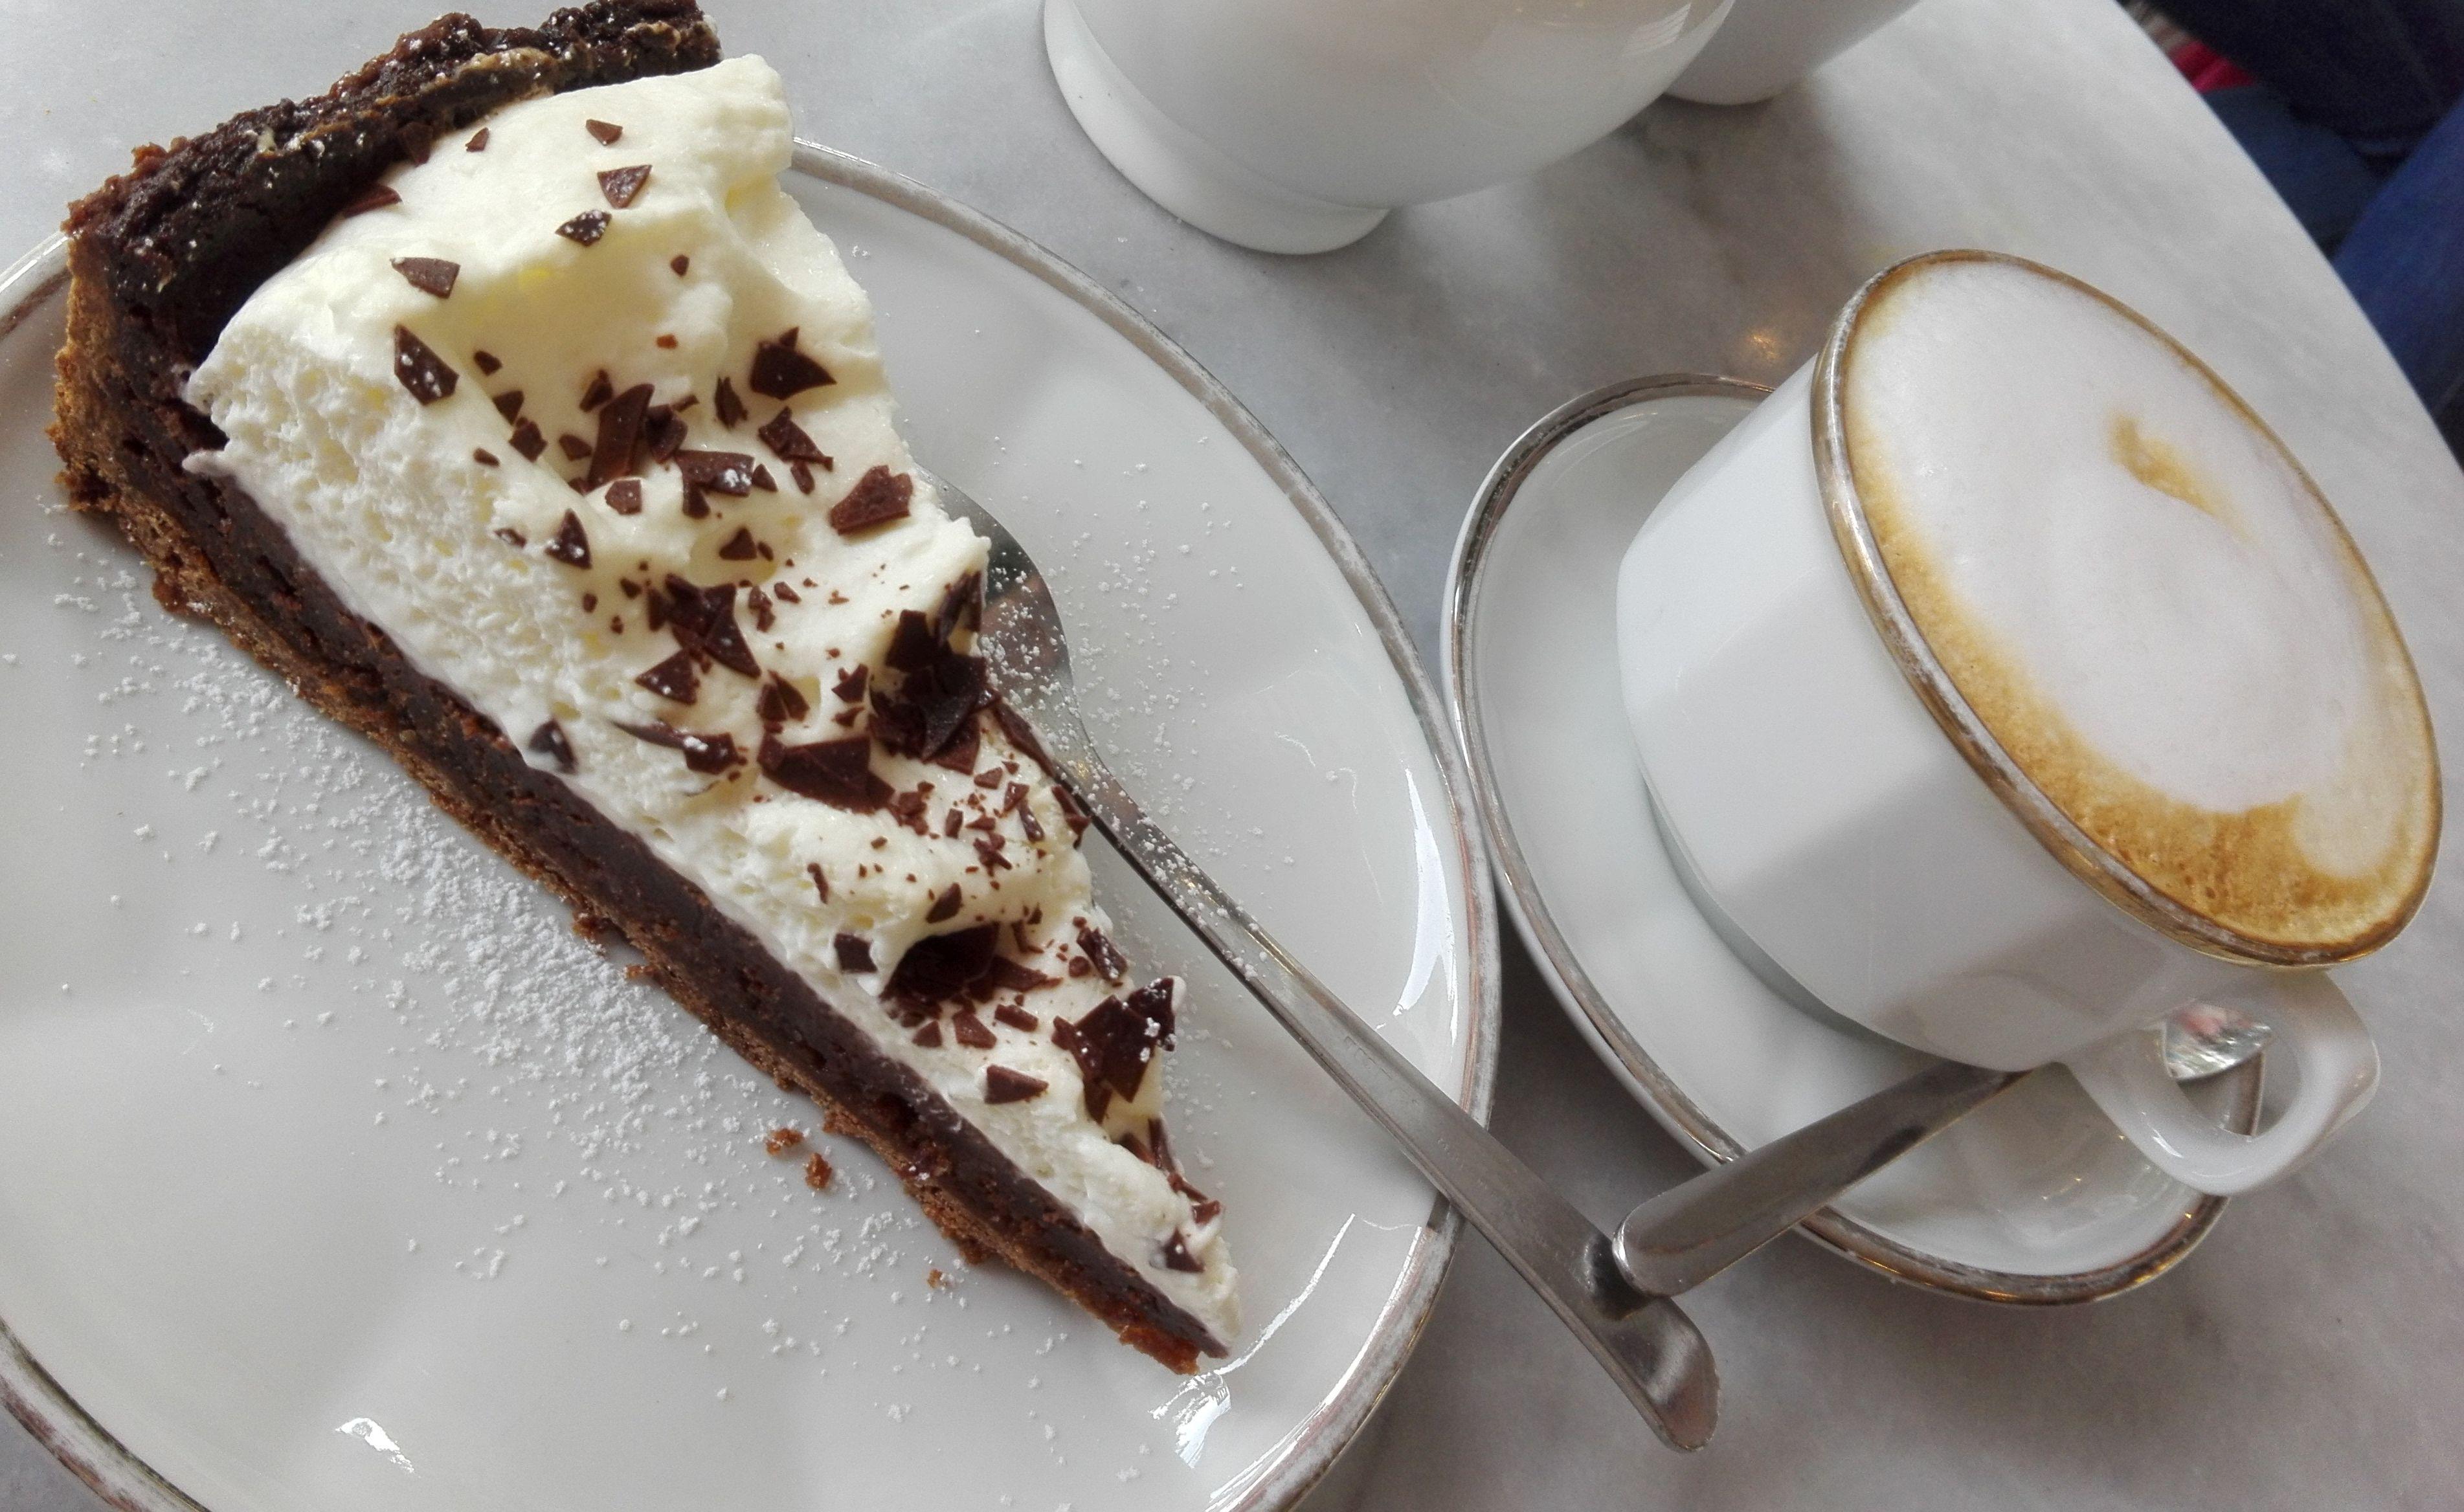 Mavandus-Torte, Mavandus Café Bückeburg